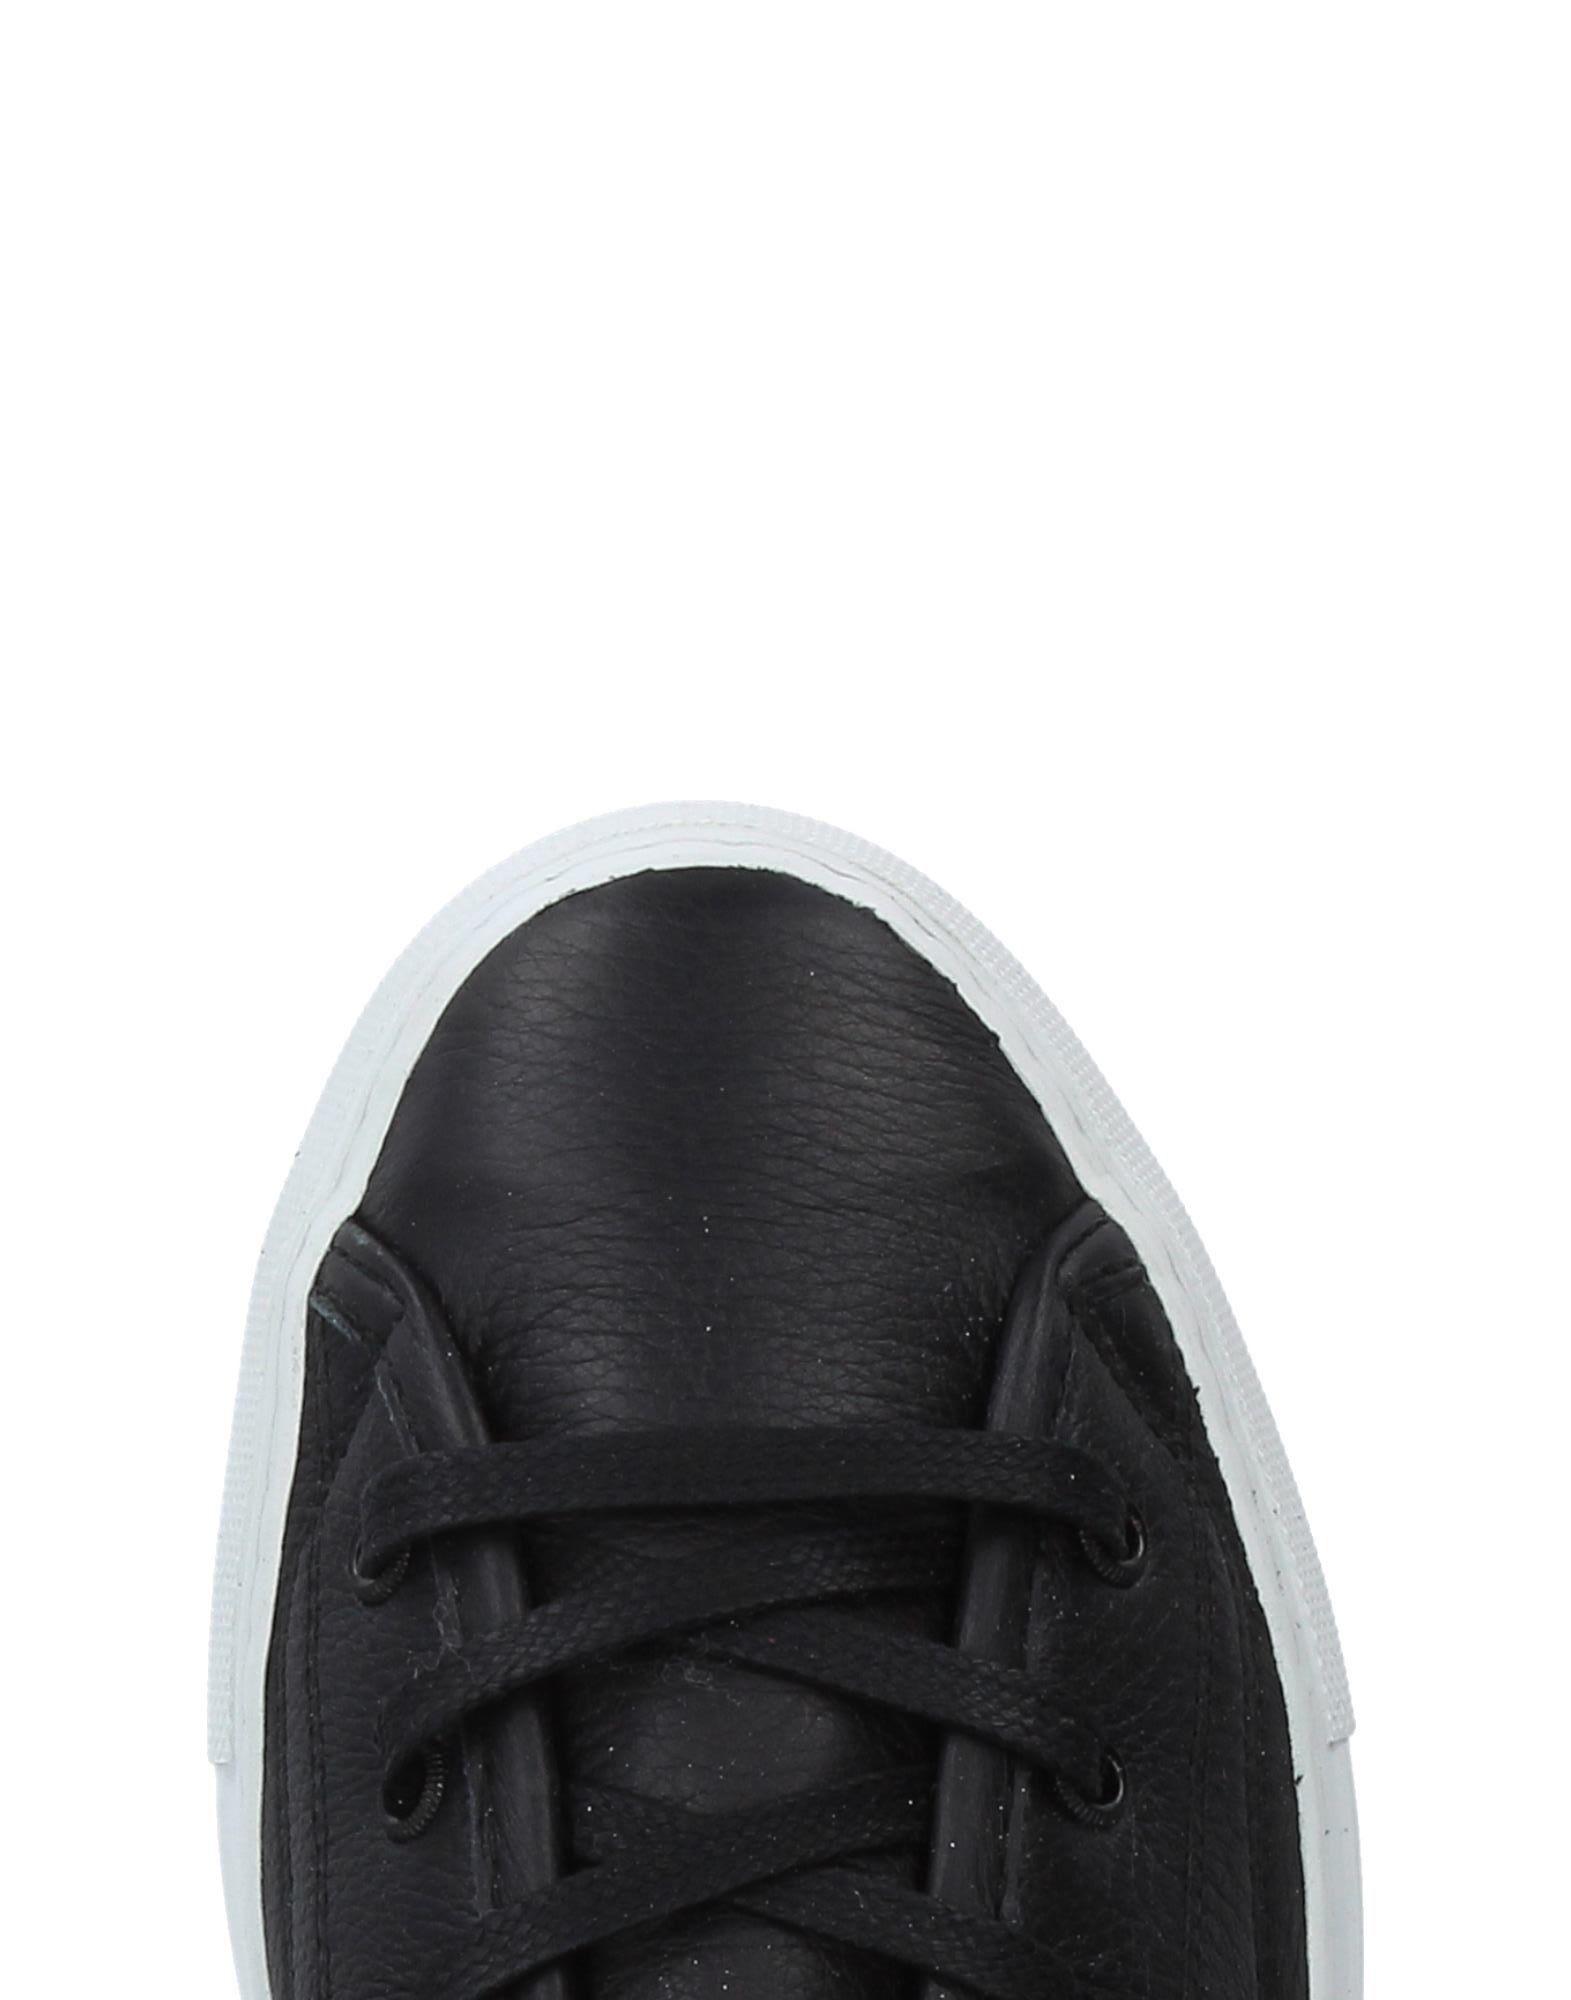 Diemme Sneakers Herren beliebte  11223834FS Gute Qualität beliebte Herren Schuhe 412ad2